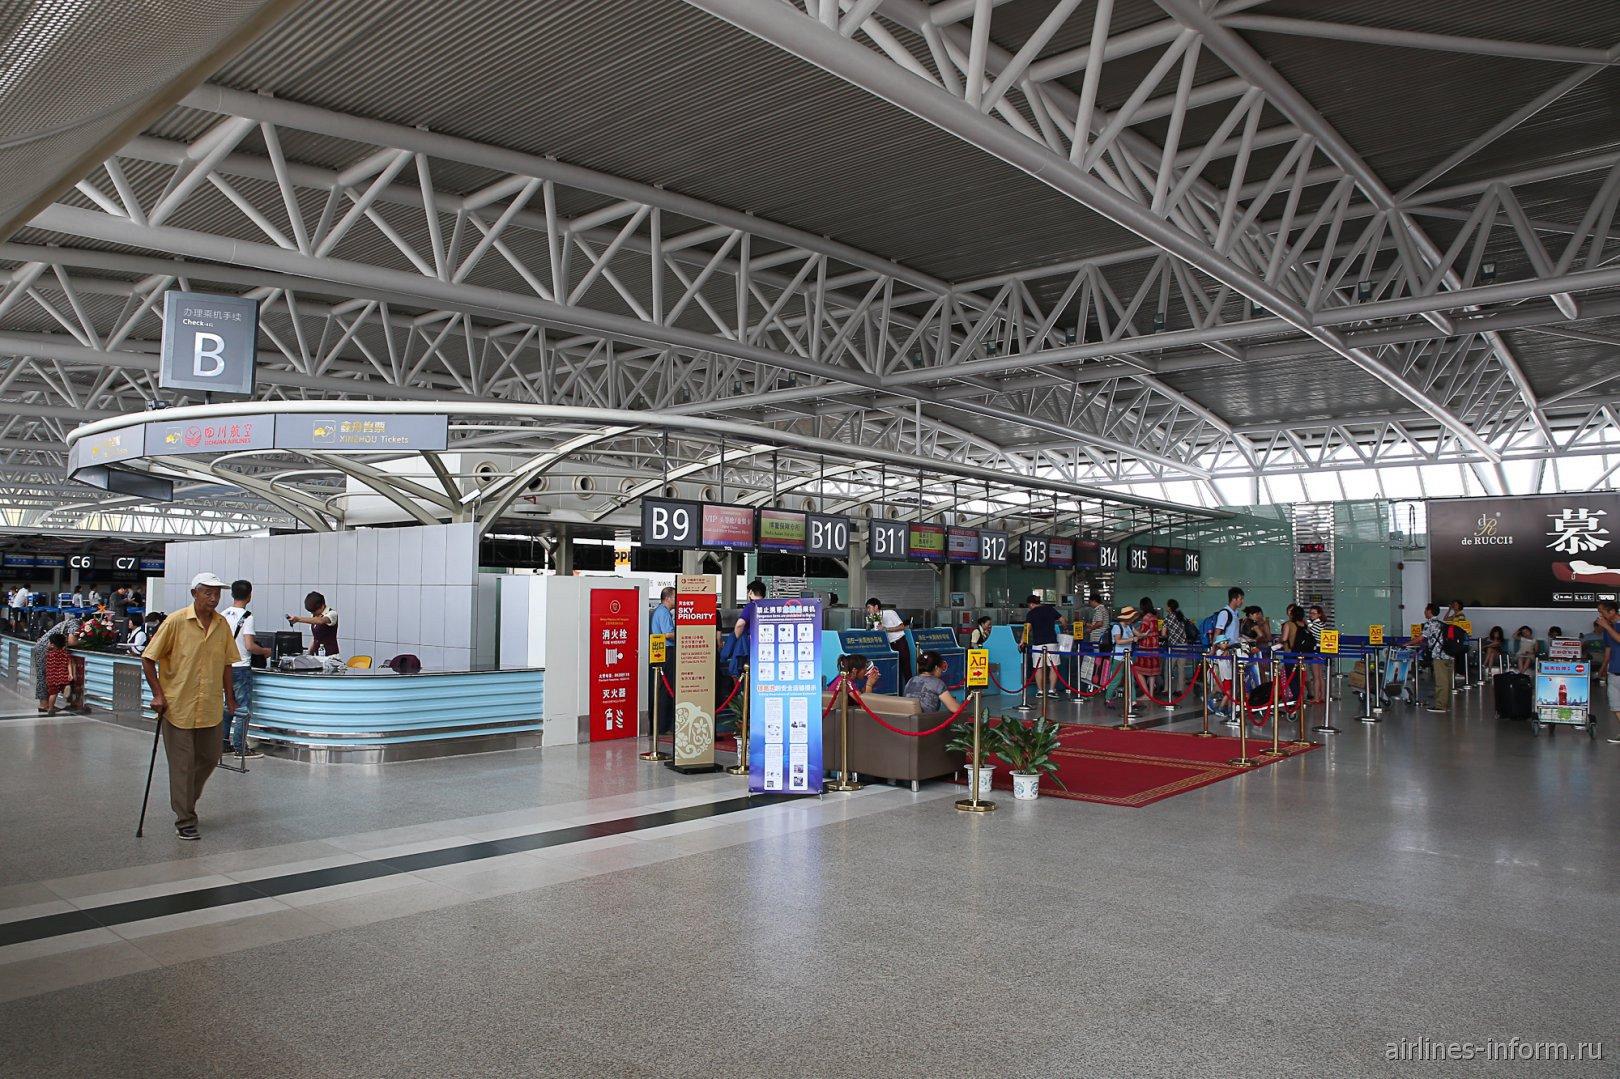 Стойки регистрации B в терминале внутренних линий аэропорта Санья Феникс